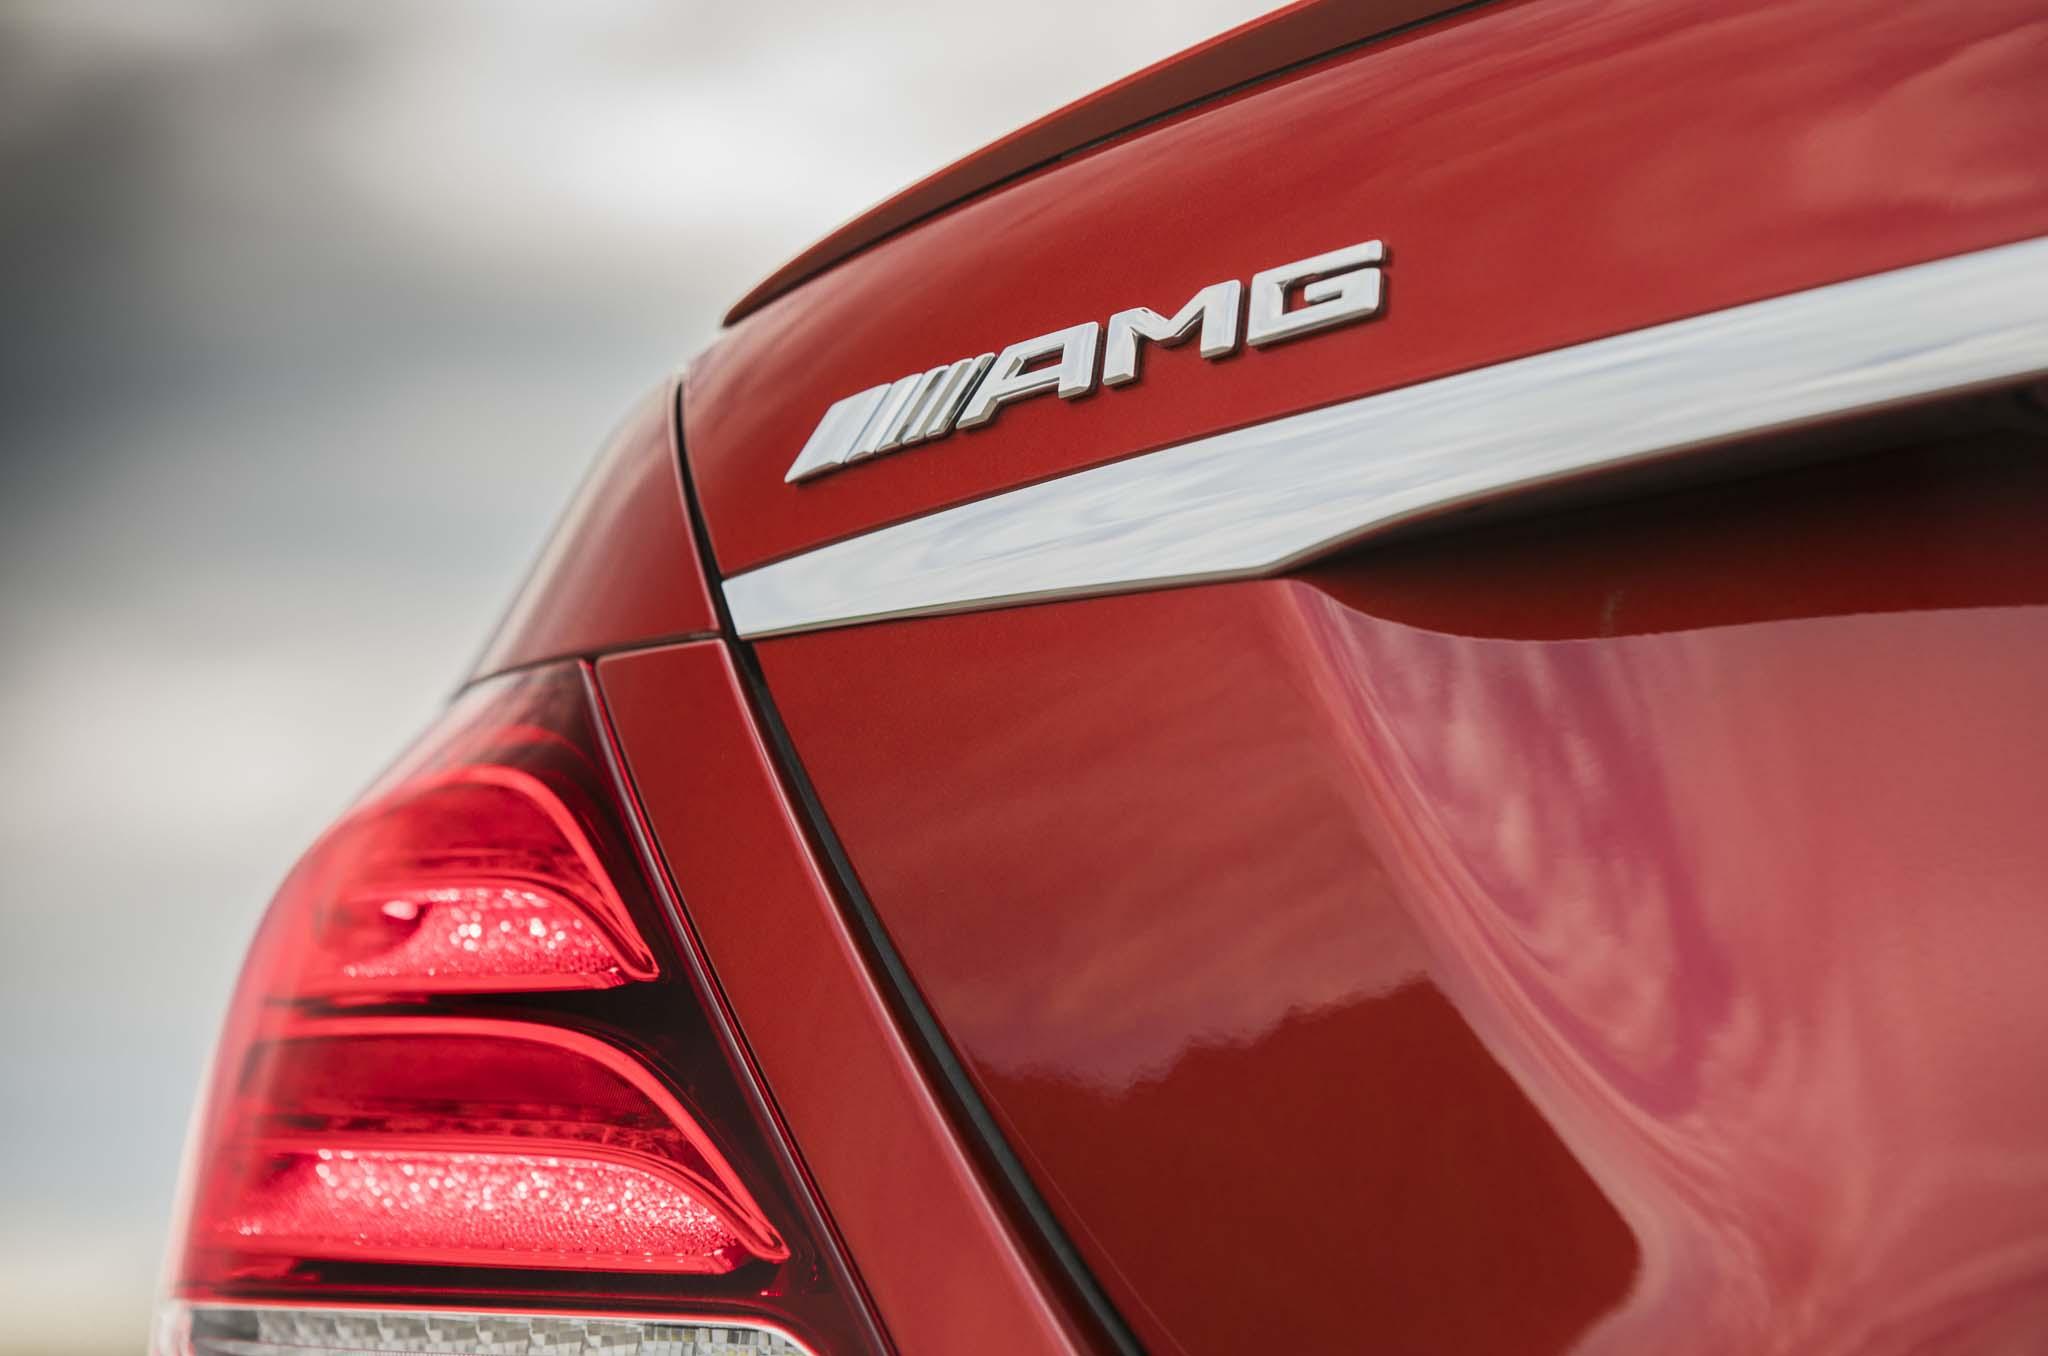 2017 mercedes ben e400 4matic wagon one week review for Mercedes benz badge